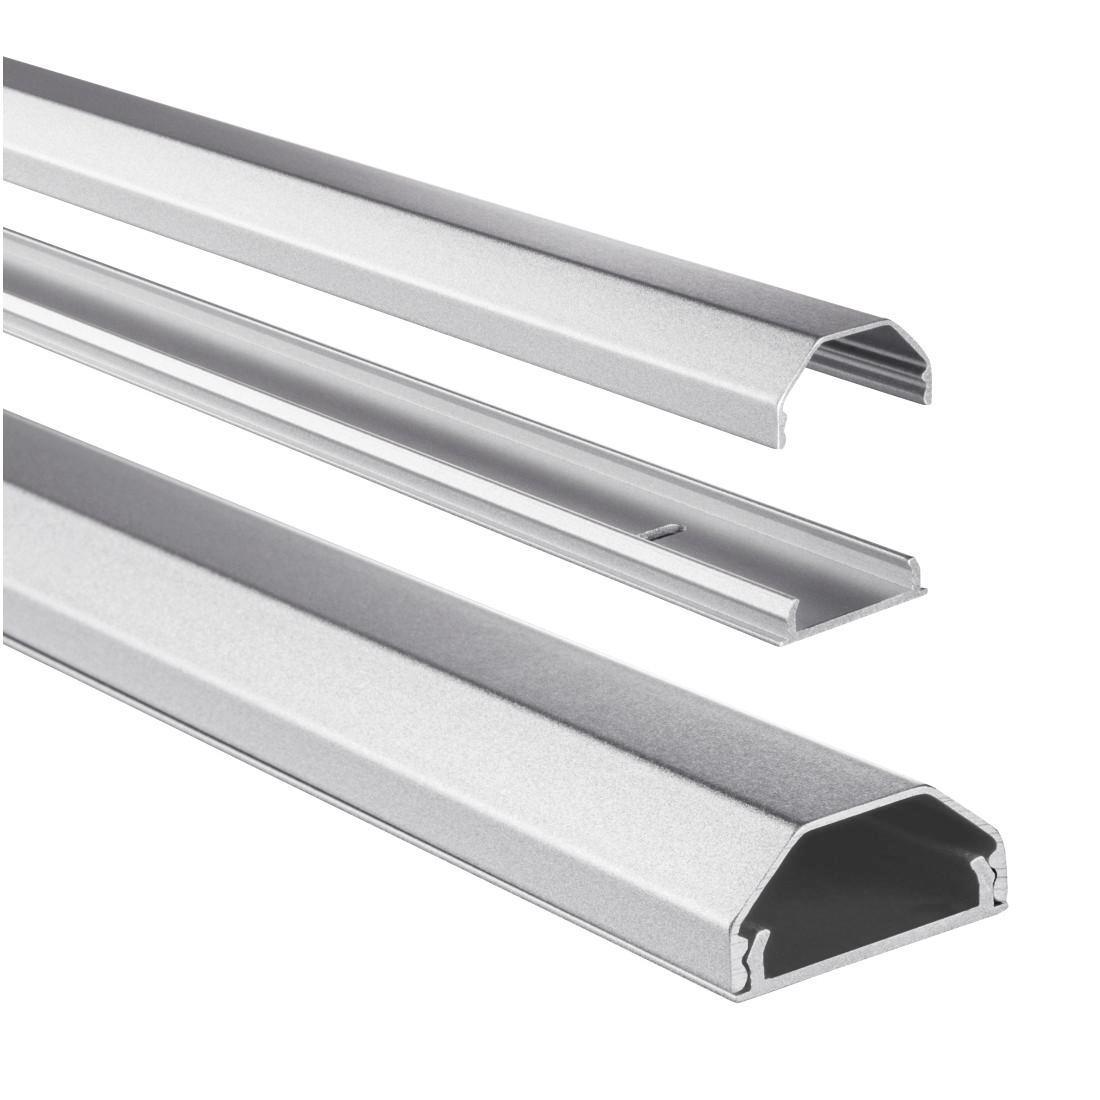 Hama Kabelkanal Alu (Aluminium Leiste für TV Wandhalterung